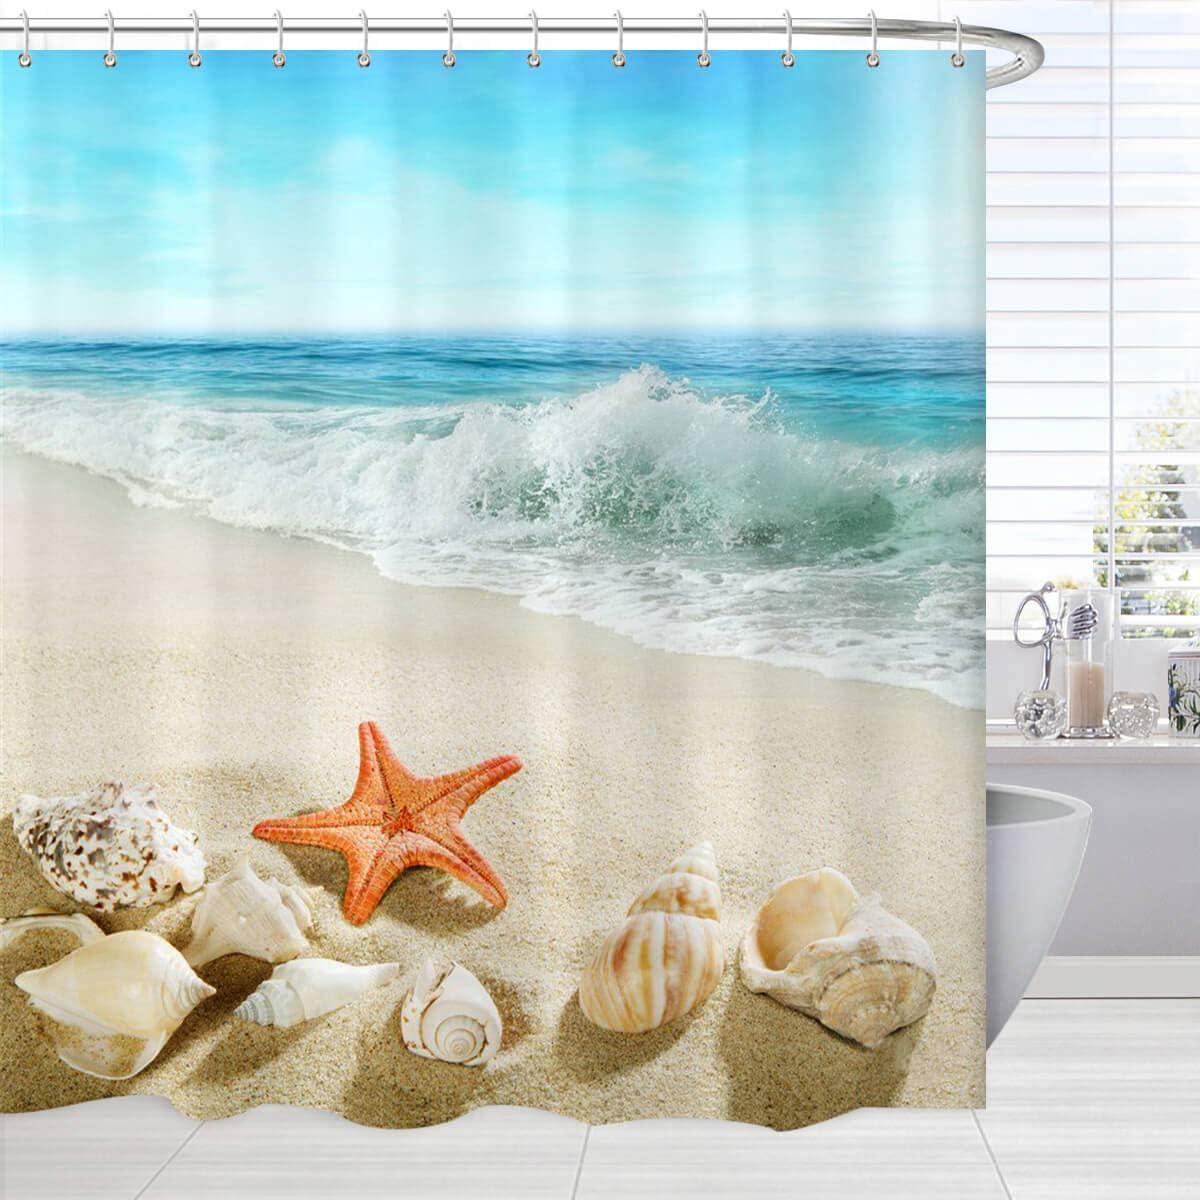 BROSHAN Beach Seashell Shower Curtain, Sea Shells Starfish Conch Stones on Beach Blue Ocean Bath Bathtub Curtain Home Decor, Seaside Bathroom Decor and Accessories Set